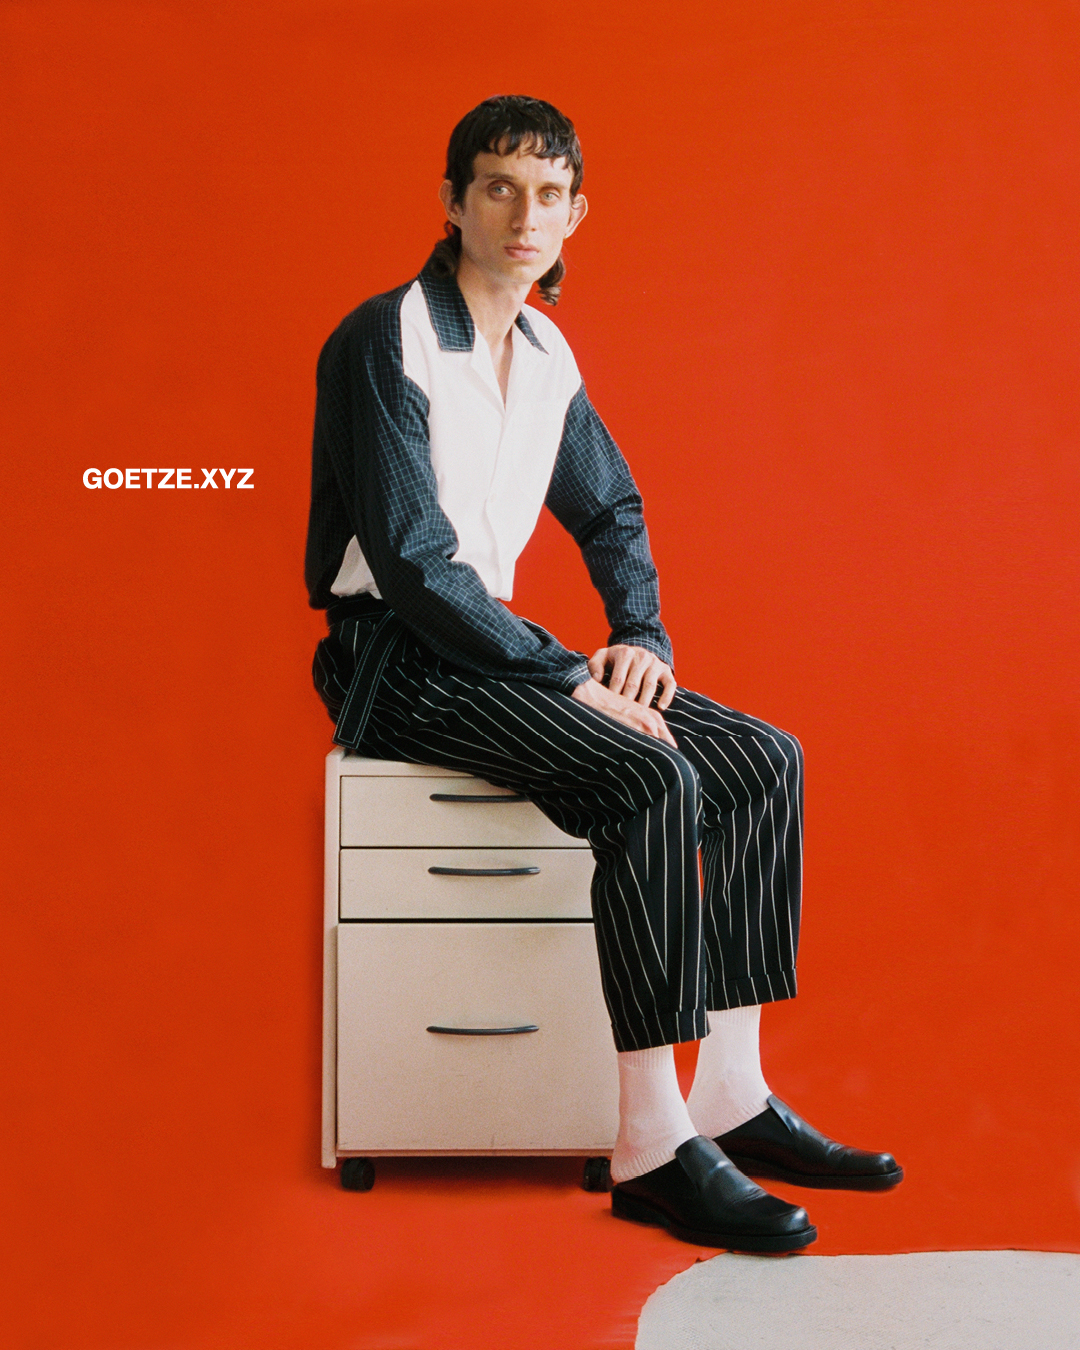 GOETZE_FW2018_DAVIT GIORGADZE_ CHRISTIAN STEMMLER_1